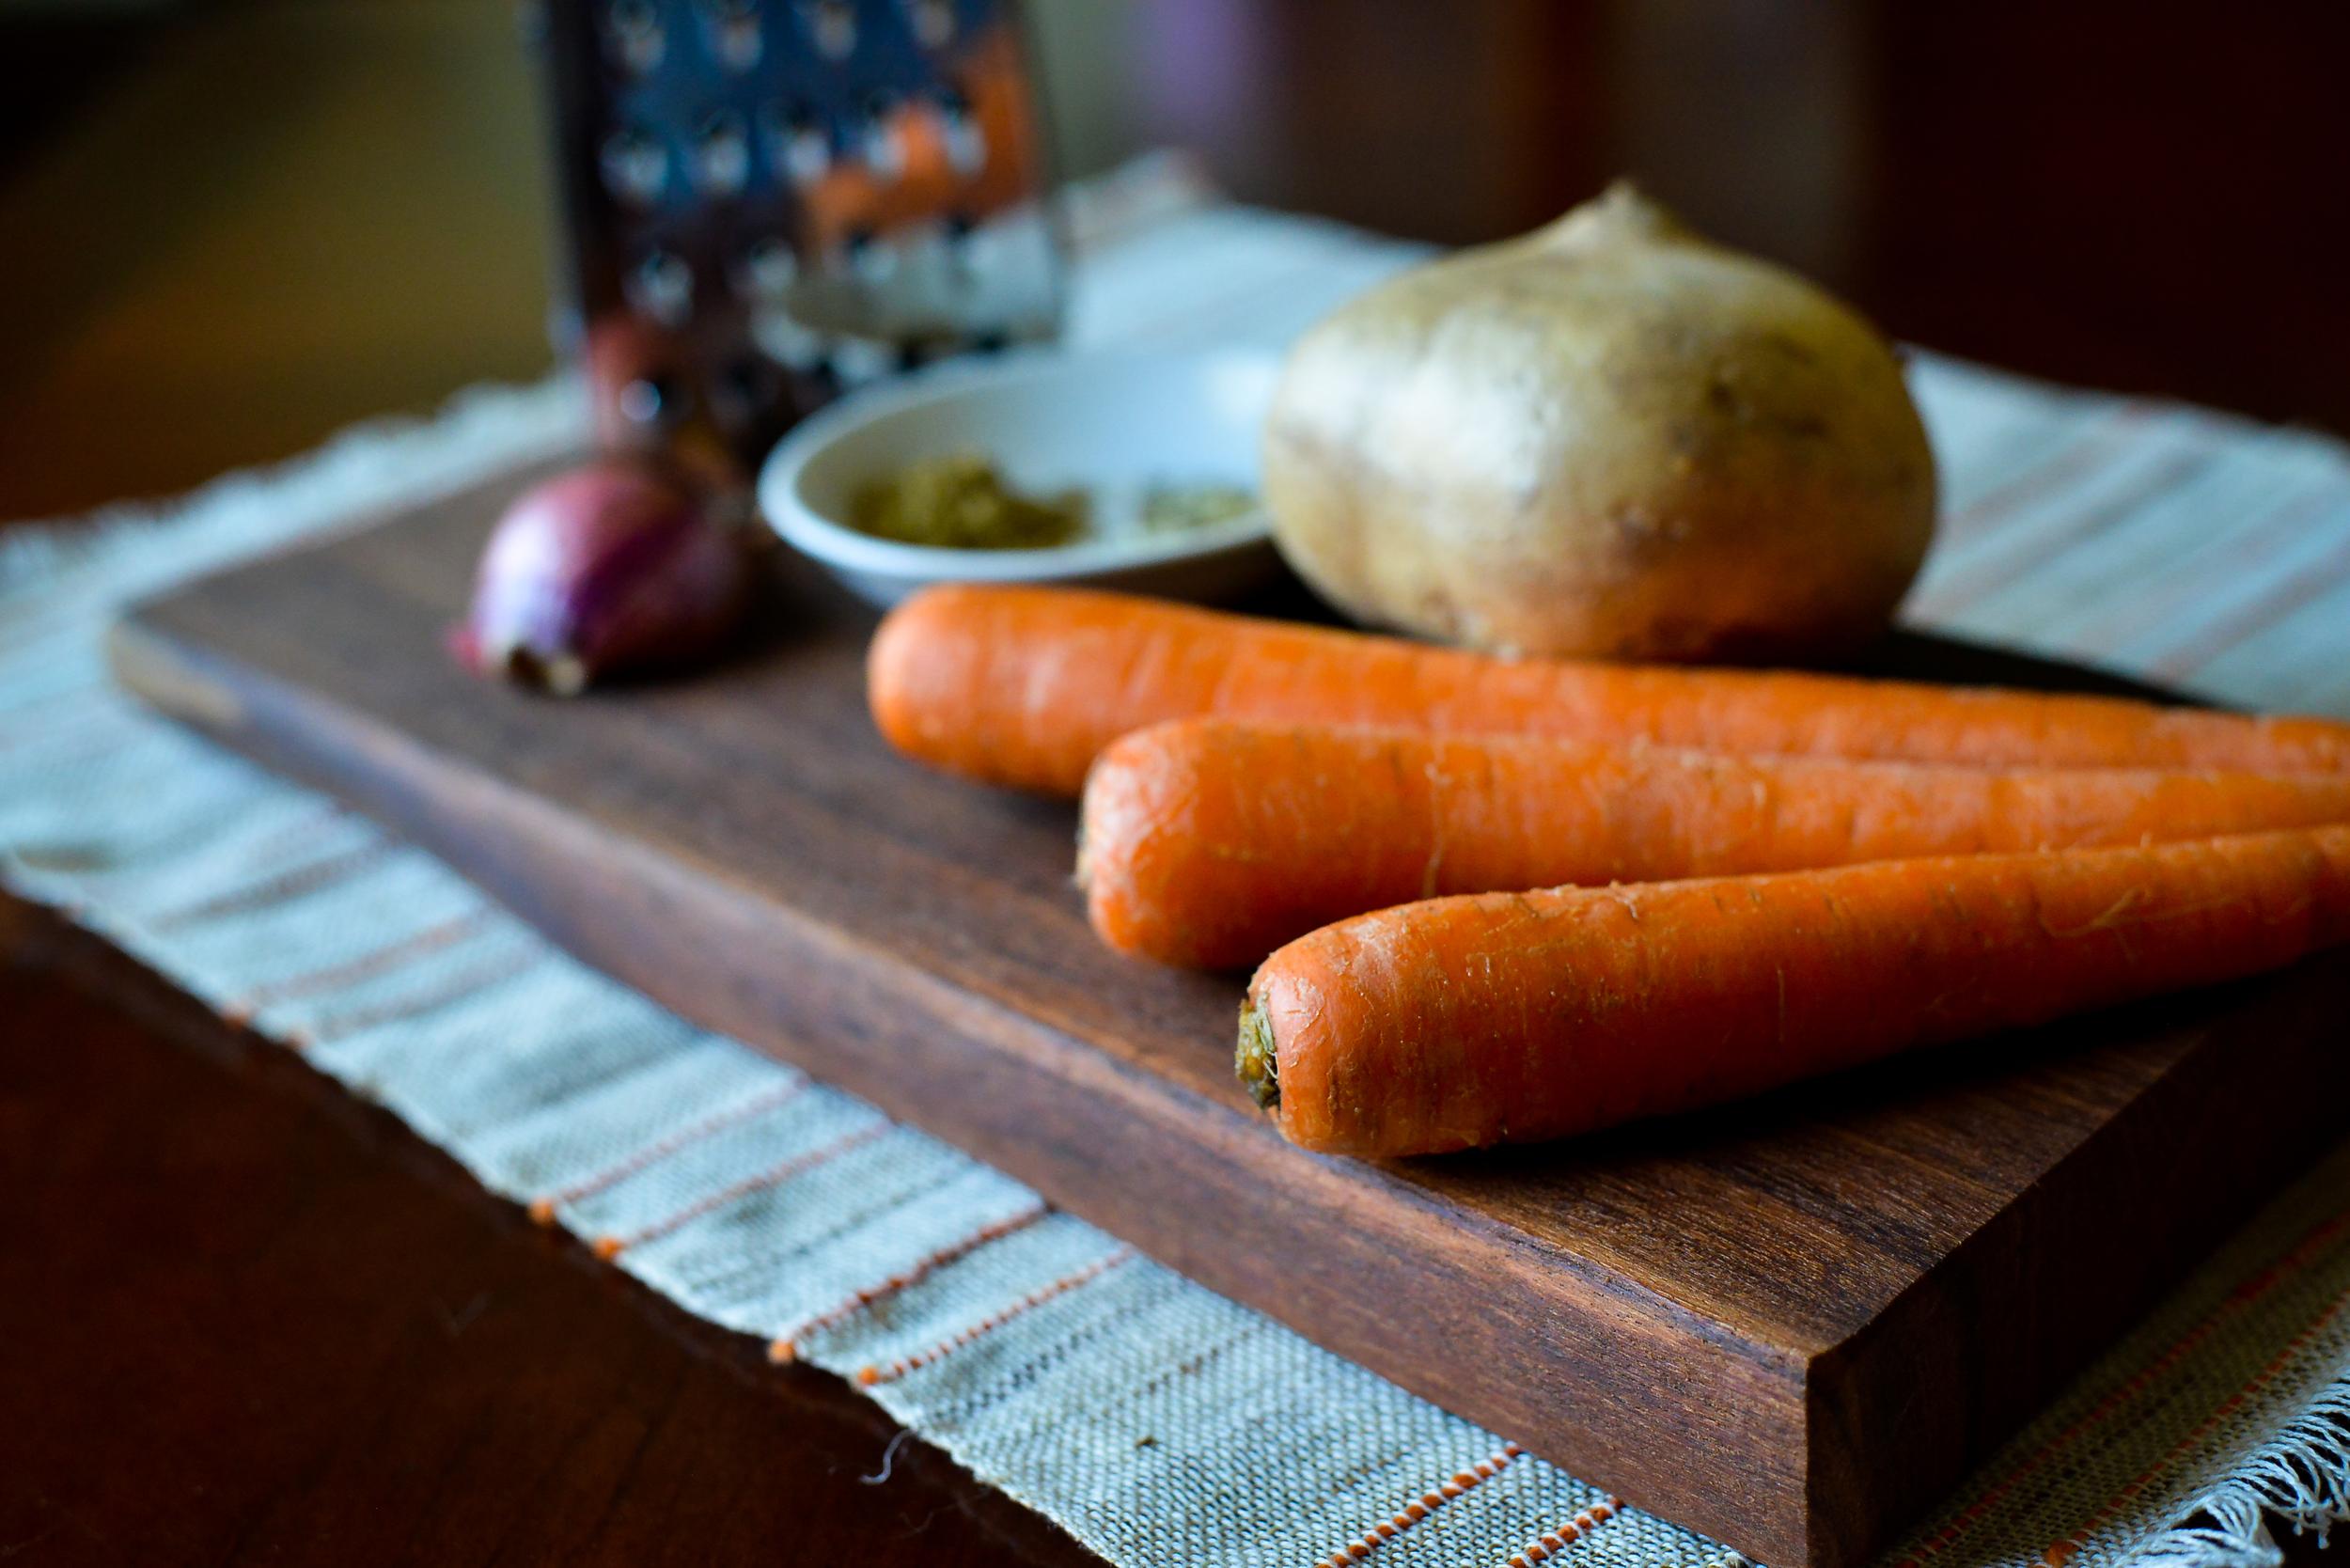 Carrot jicama pics.jpg